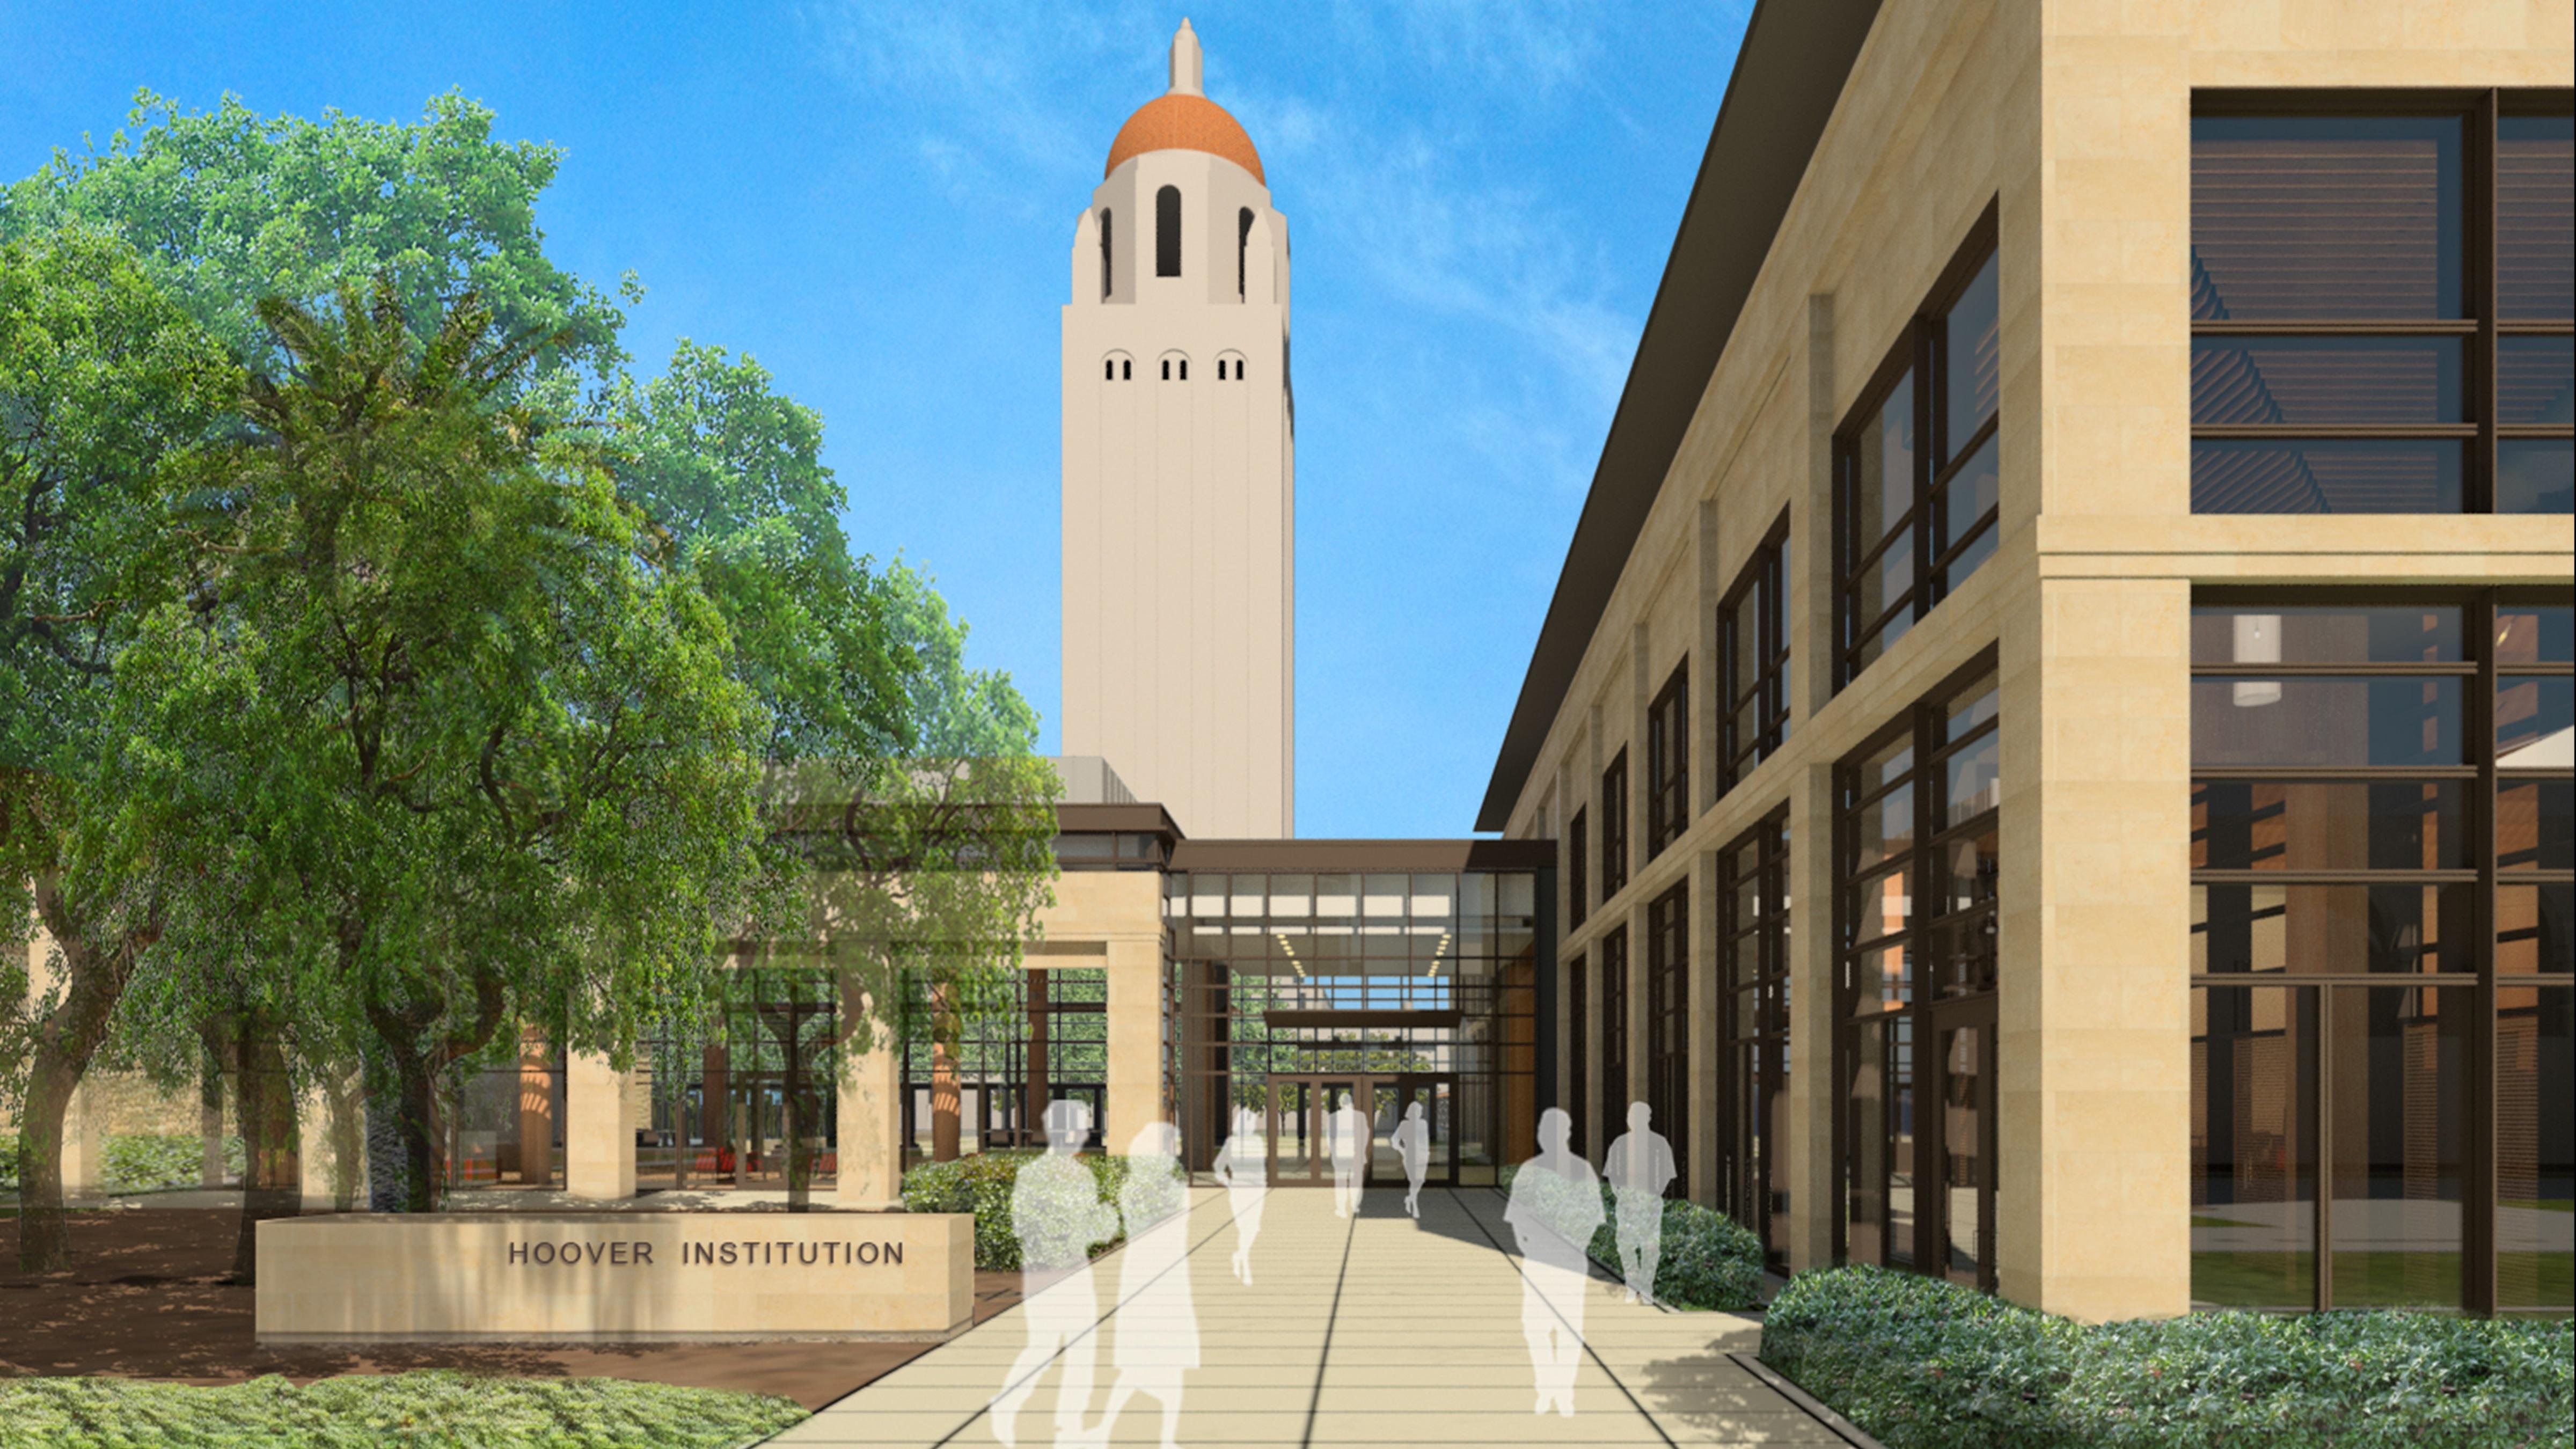 Groundbreaking Ceremony Held For New Hoover Institution